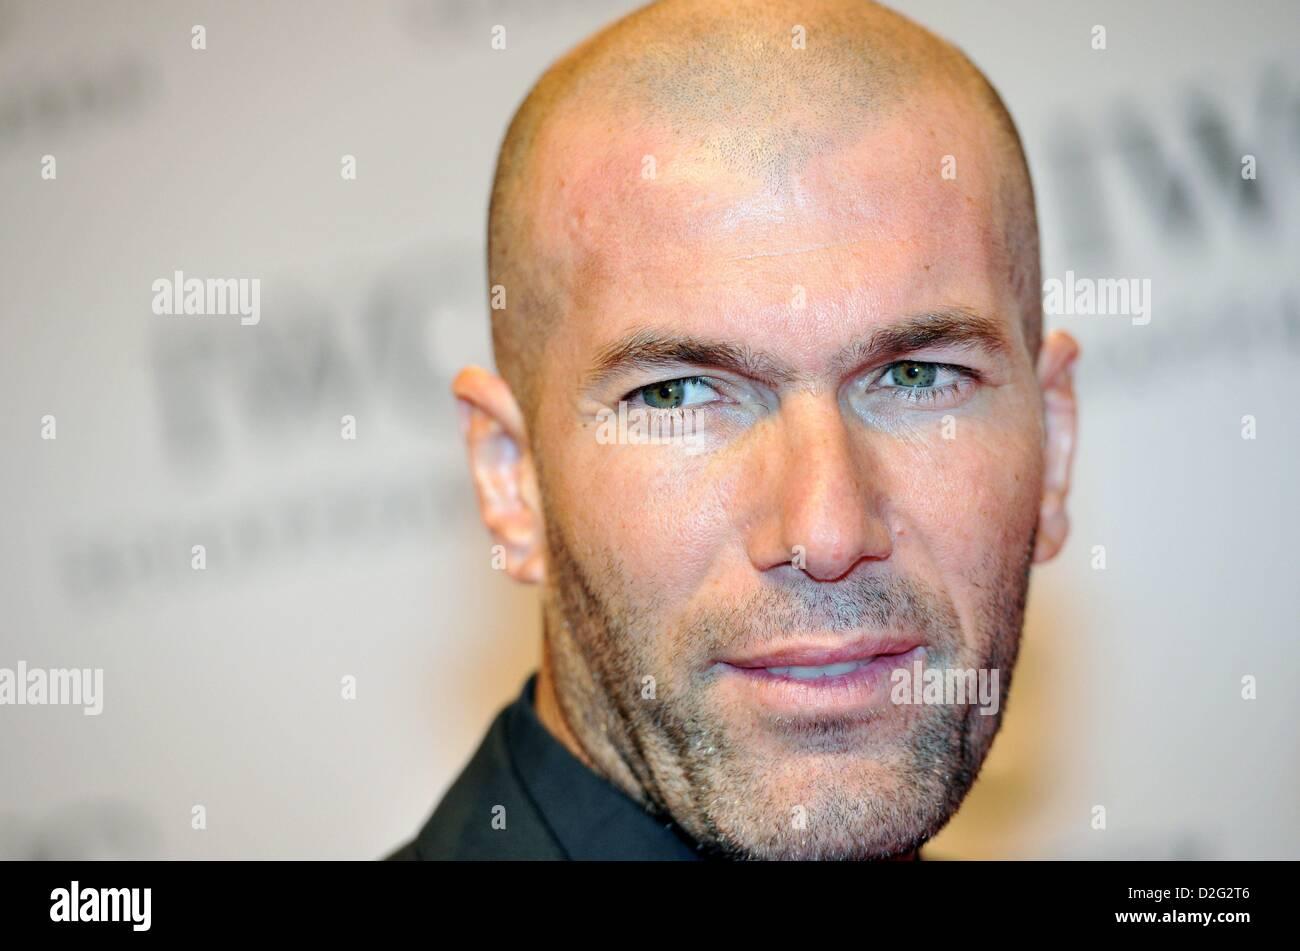 Geneva, Switzerland. 22nd January 2013. Former French Soccer Player Zinedine Zidane attends at IWC Race Night Dinner - Stock Image